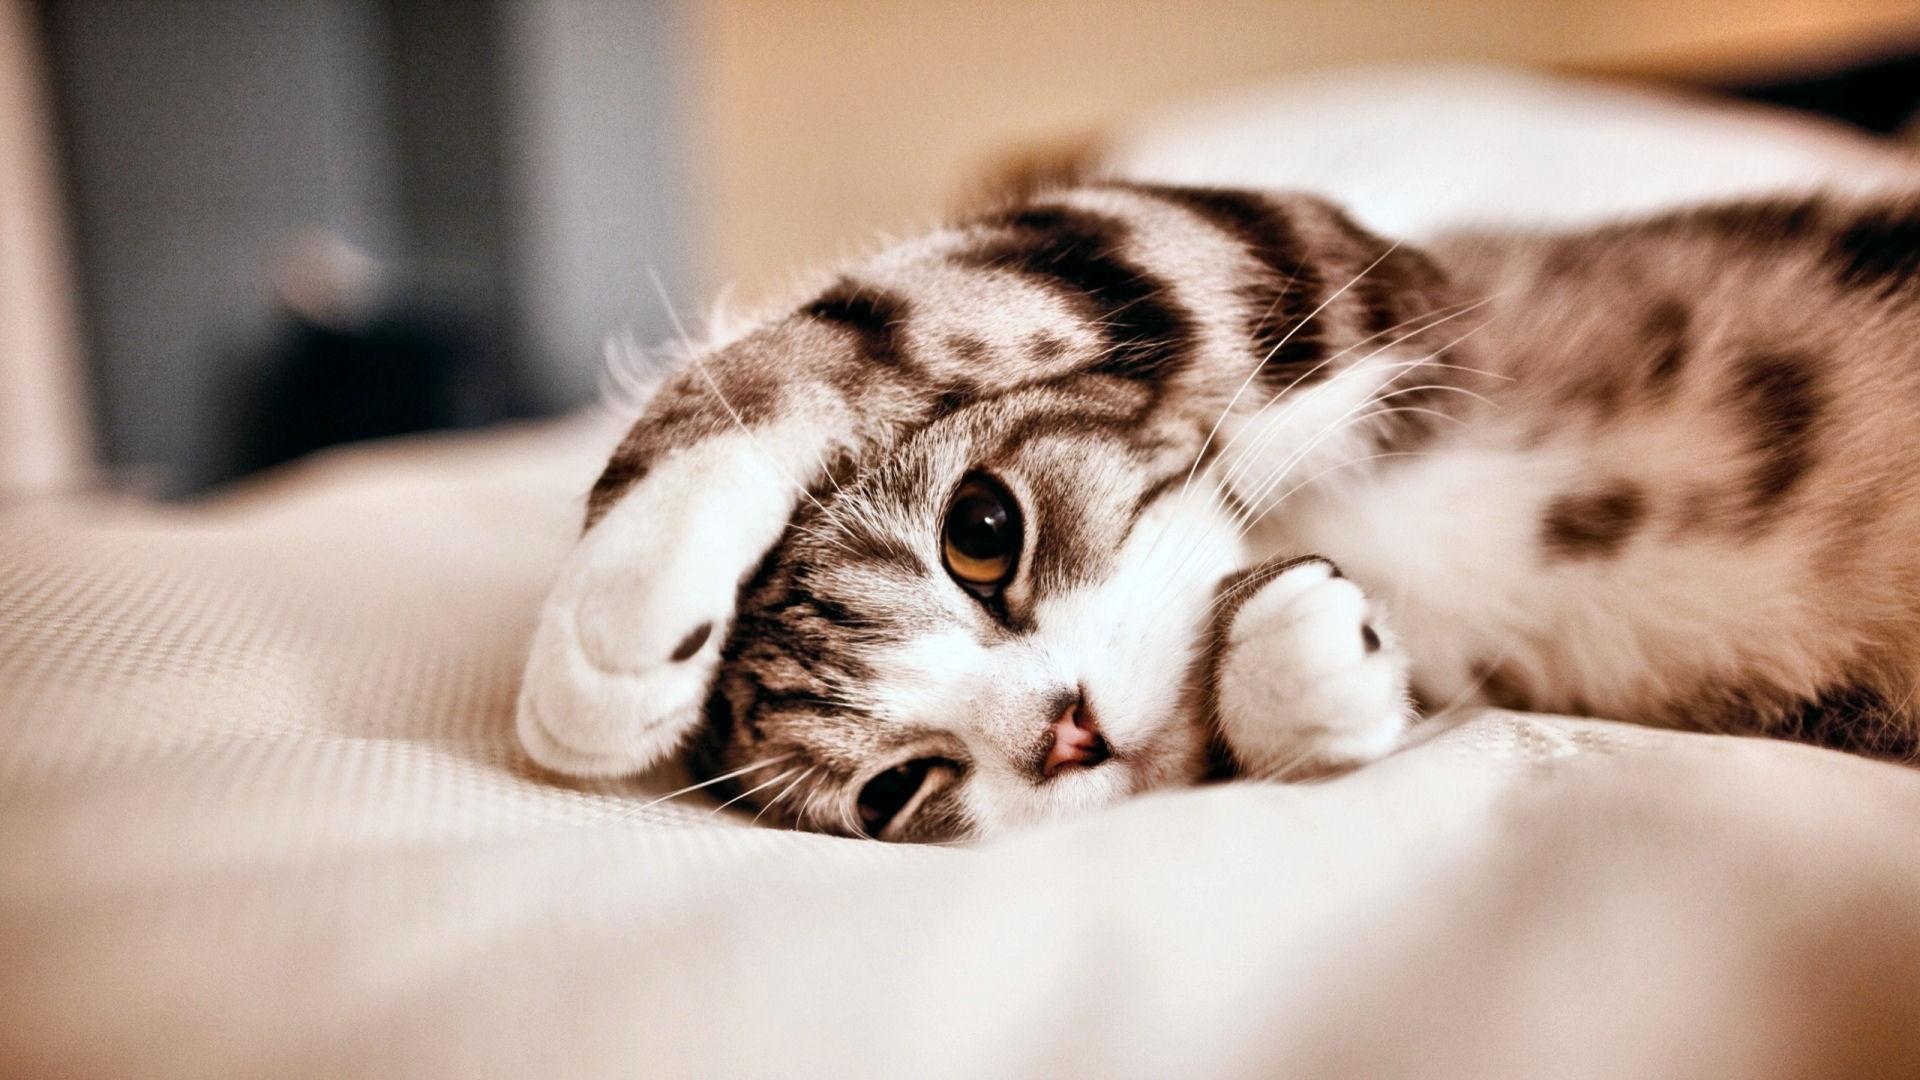 Pet Cat Wallpapers - Wallpaper Cave